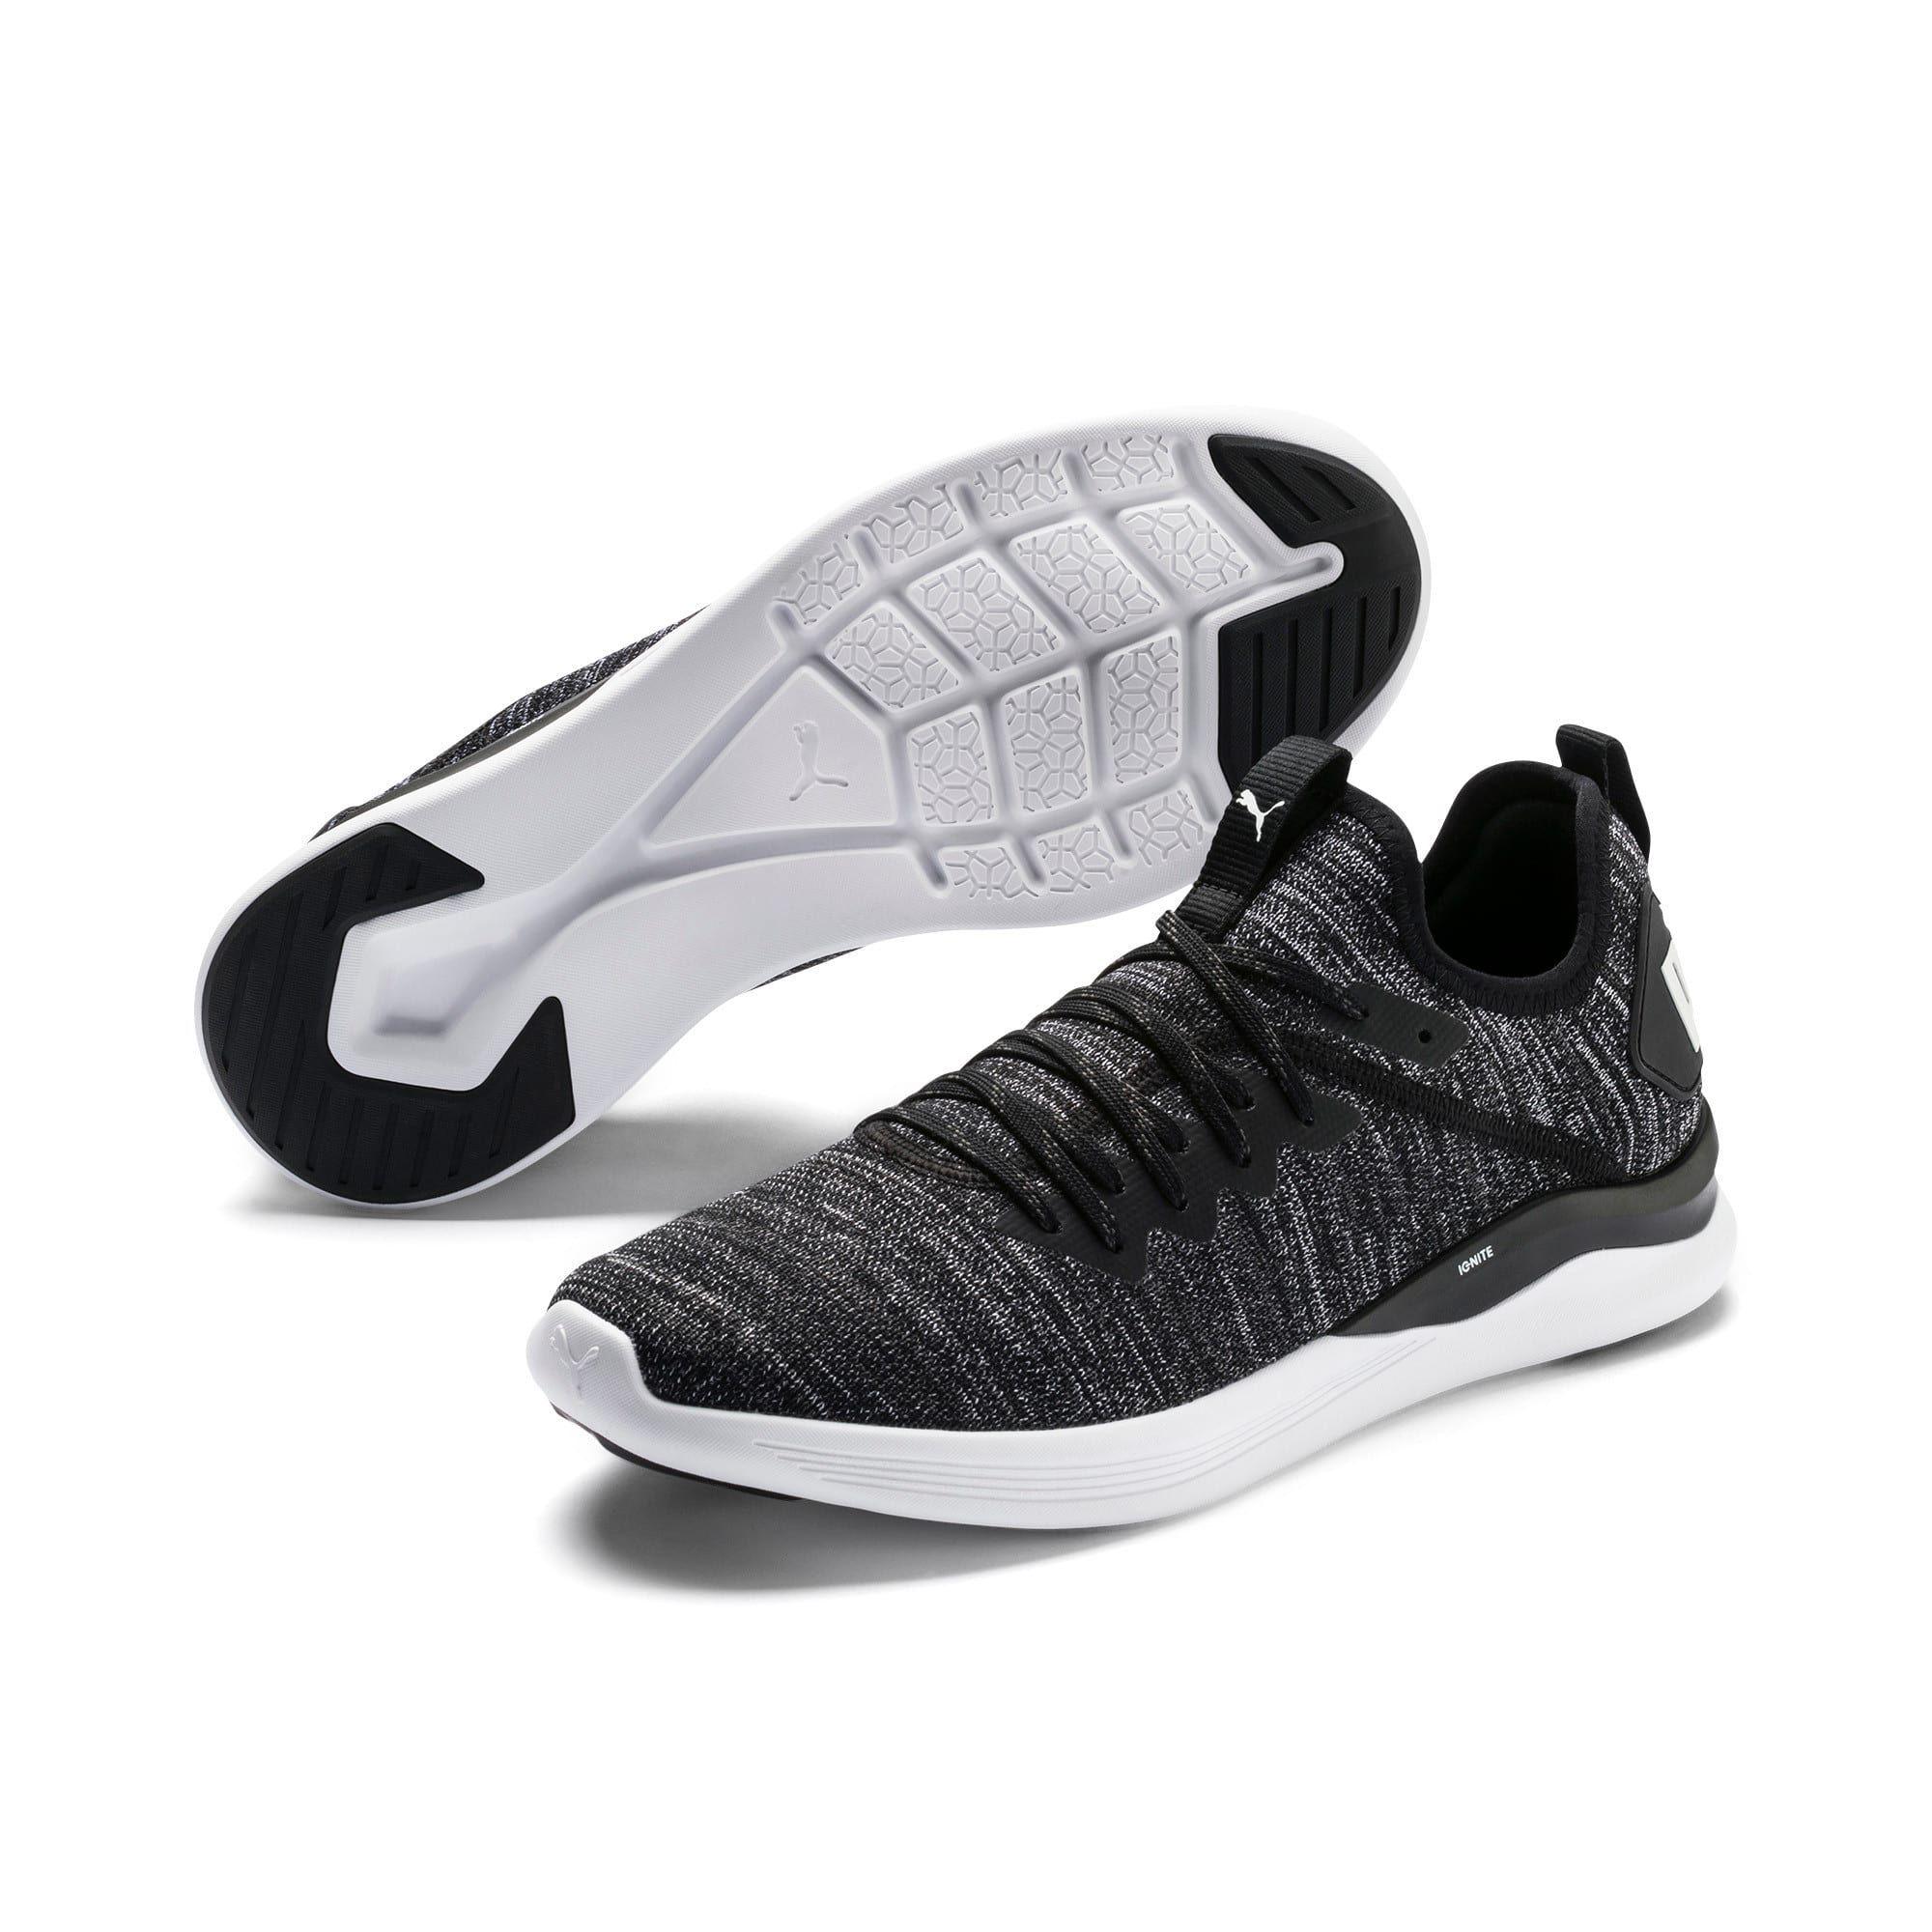 IGNITE Flash evoKNIT Men's Training Shoes | Black-Asphalt-White | PUMA New Arrivals | PUMA United Kingdom #nikefreeoutfit